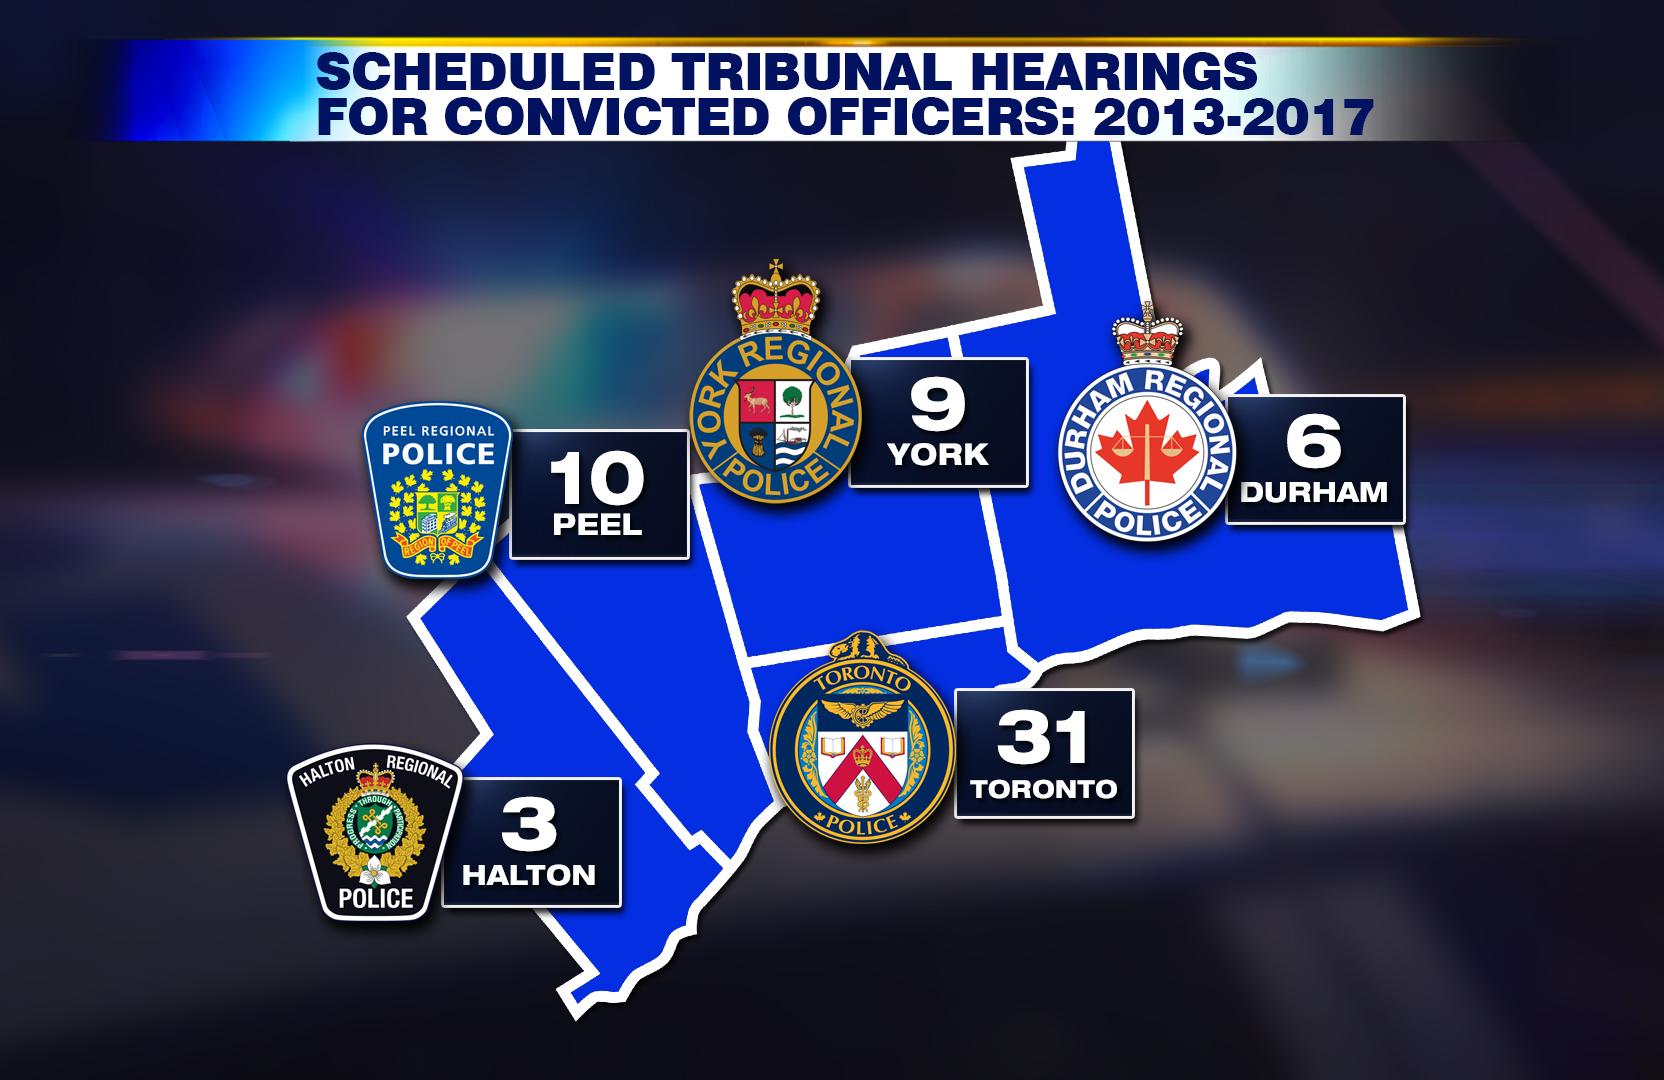 GTA Police Tribunal Hearings